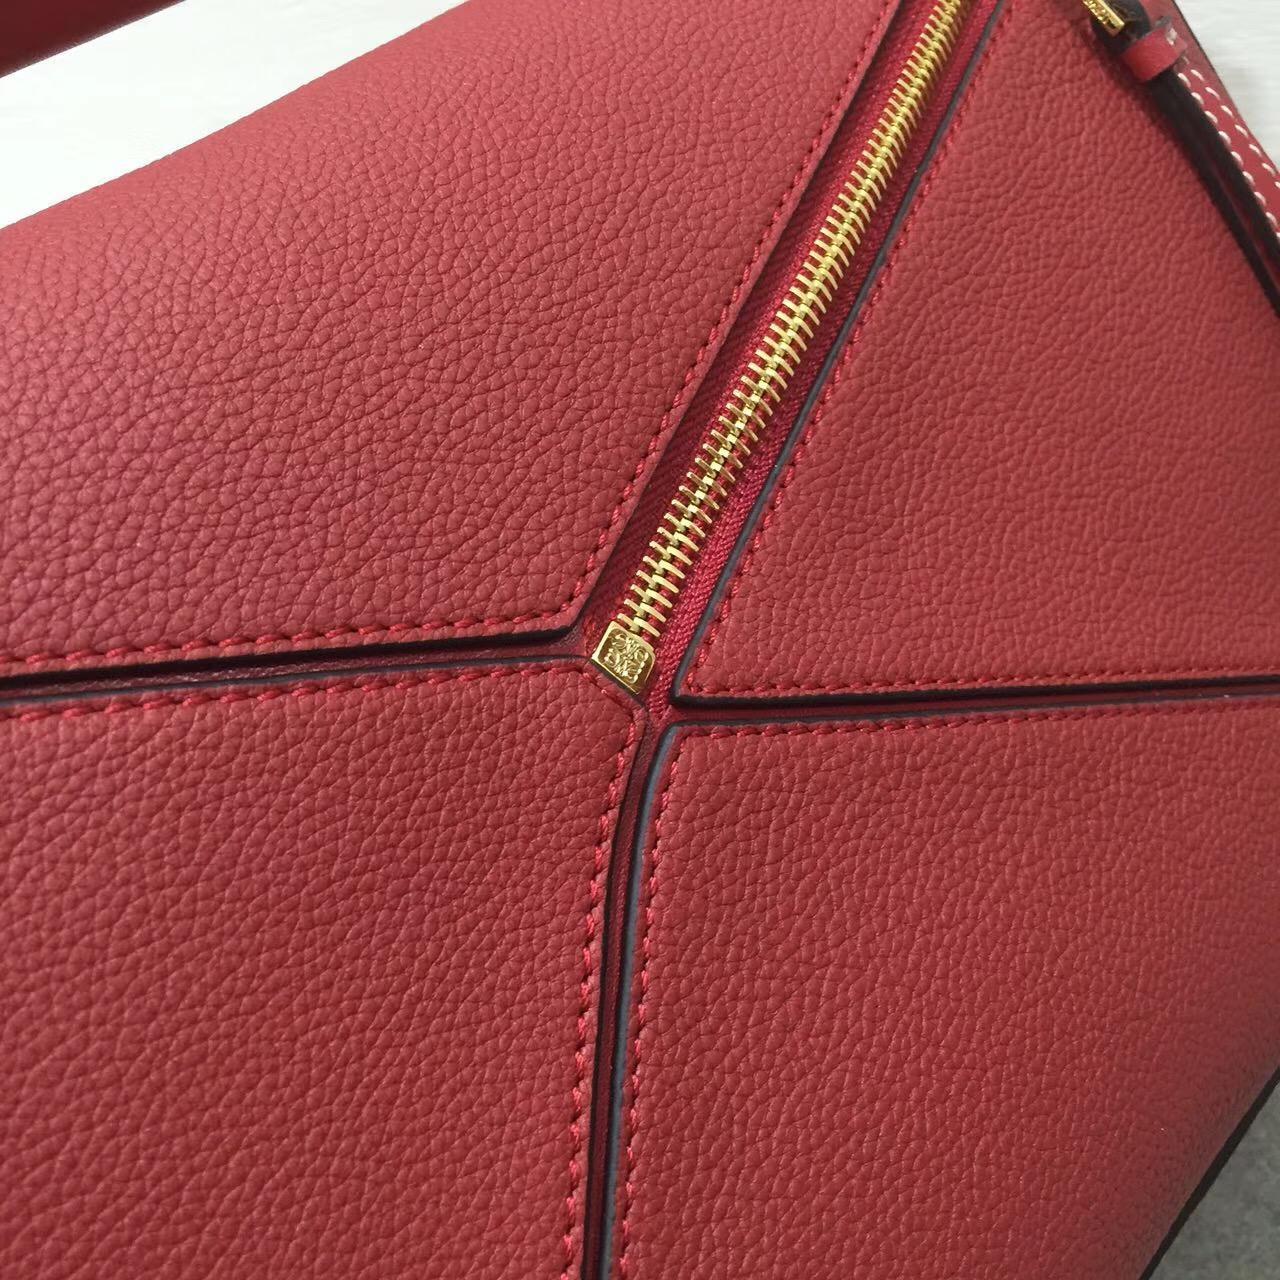 Loewe羅意威中號 Puzzle Bag 顆粒小牛皮胭脂红